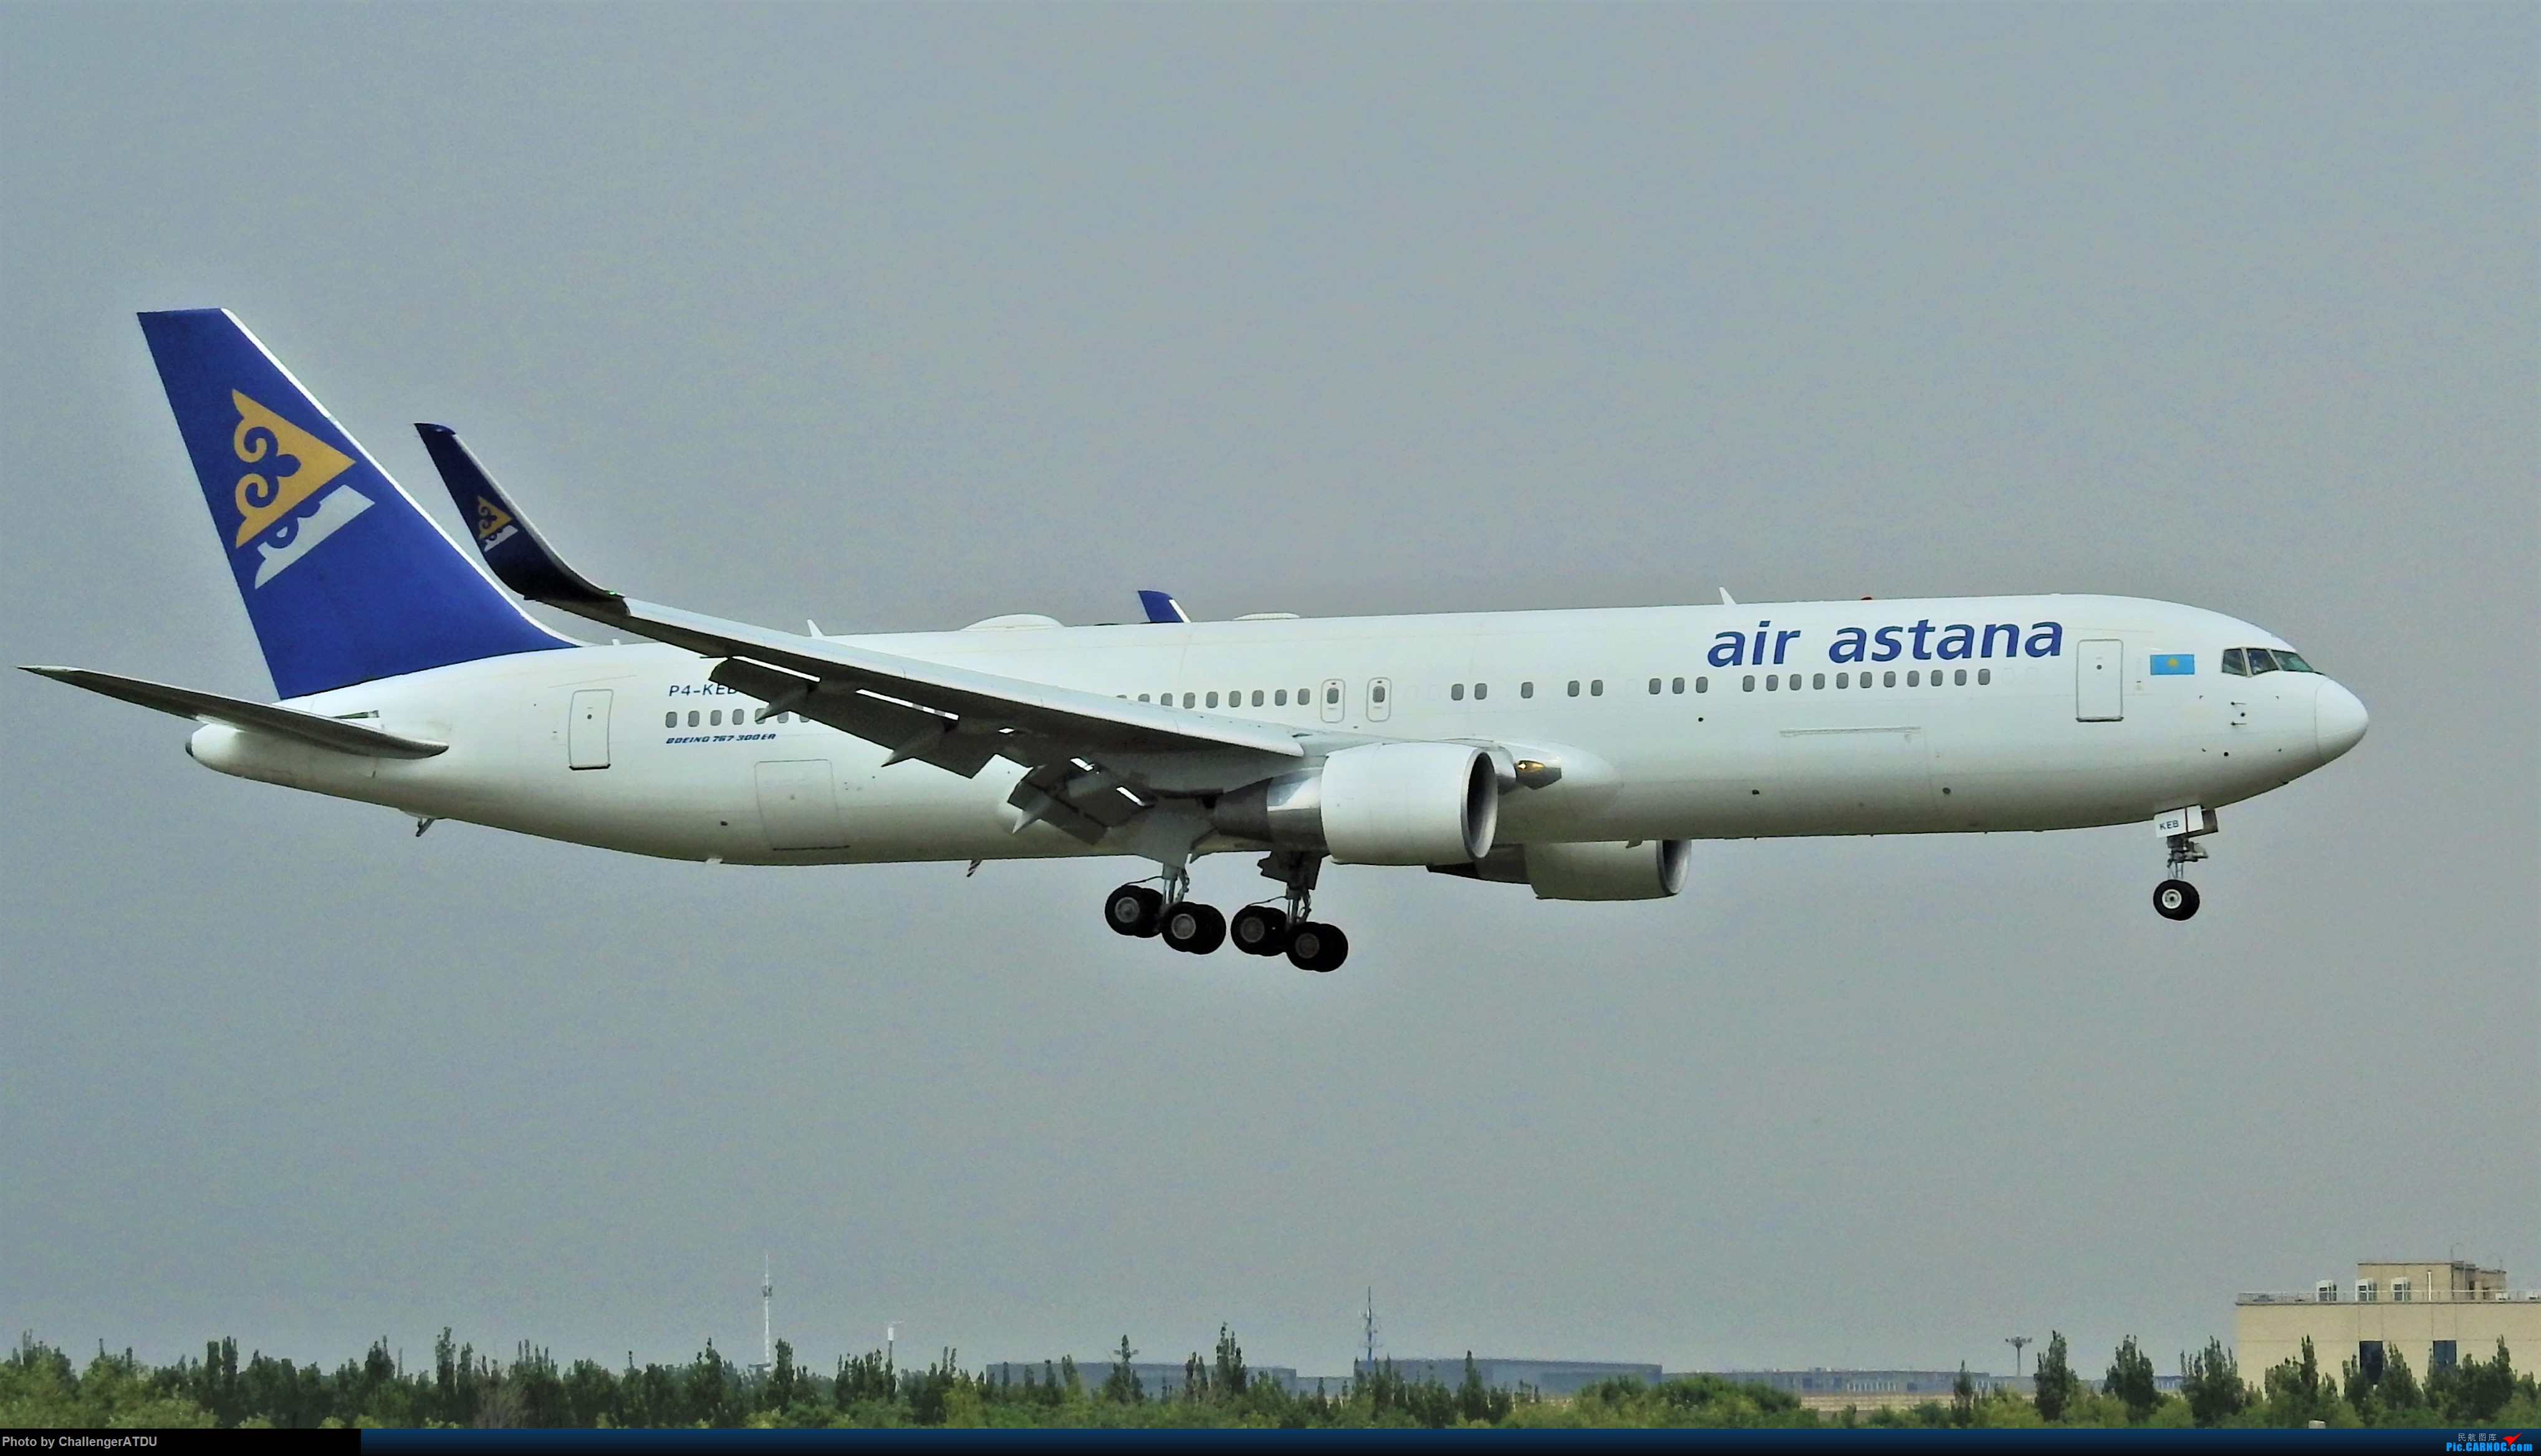 [原创]2020-5-30 萌新のPEK之旅 BOEING 767-300ER P4-KEB 北京首都国际机场